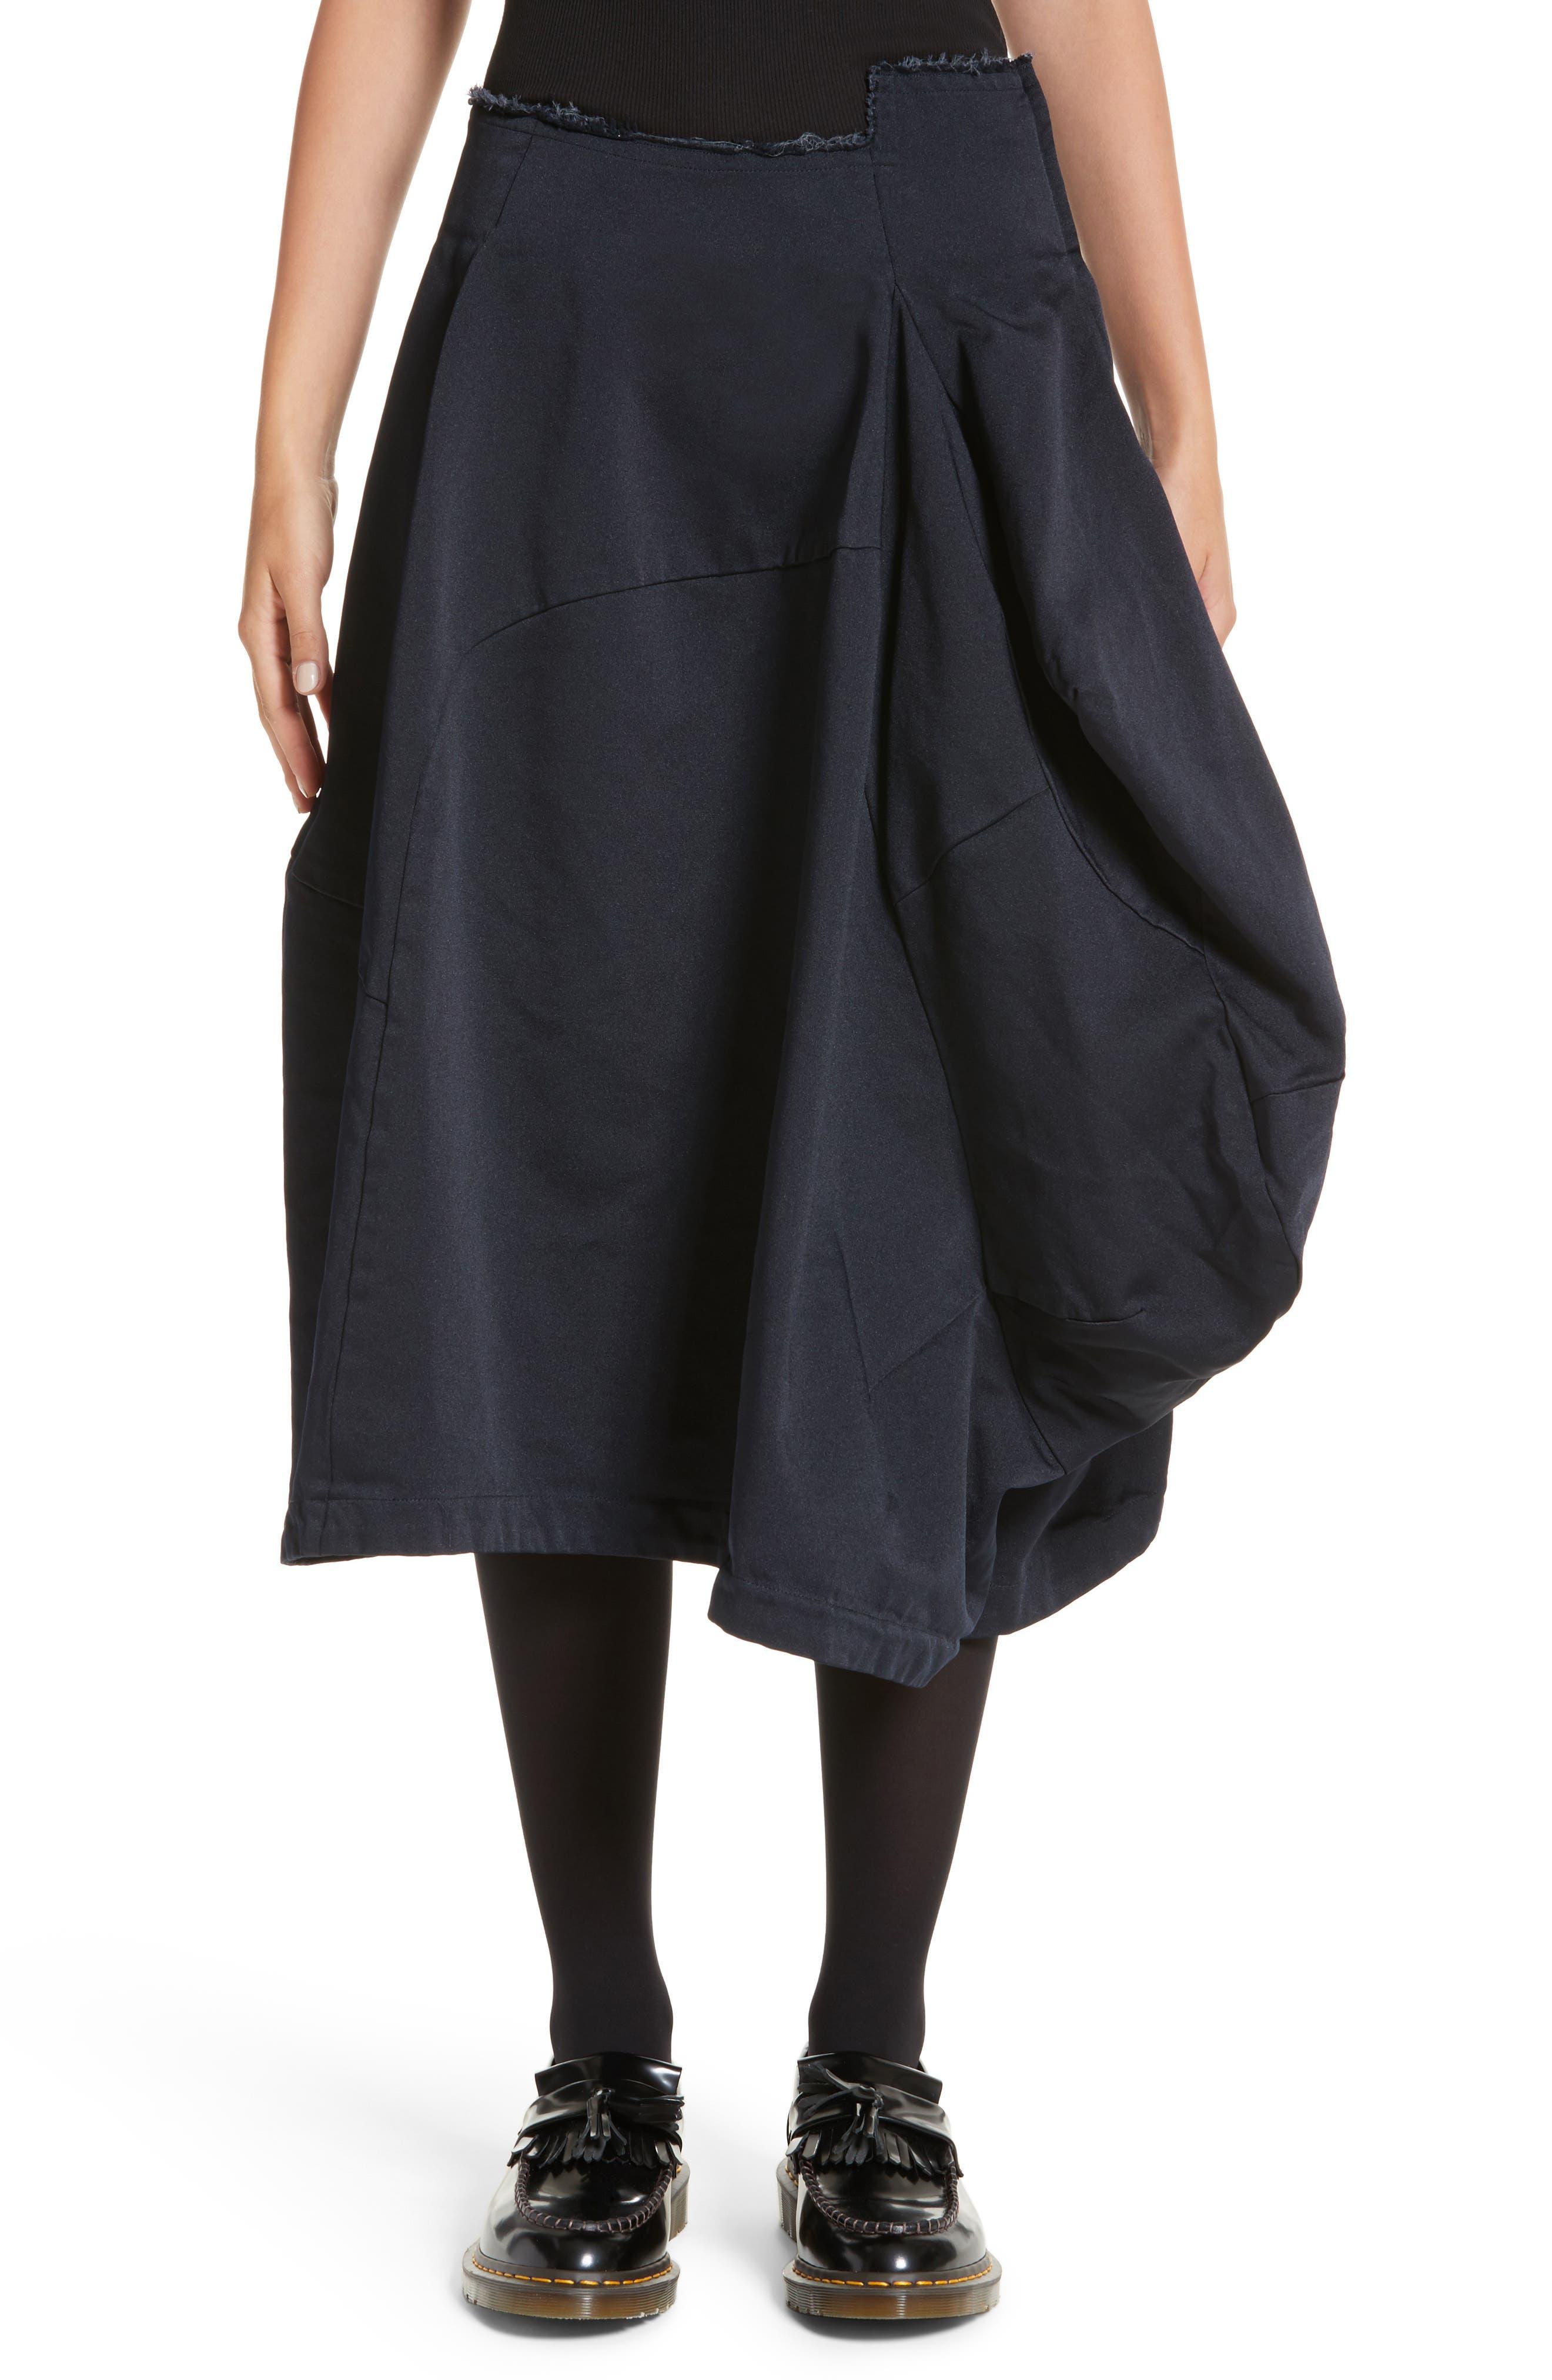 Comme des Garçons Origami Skirt